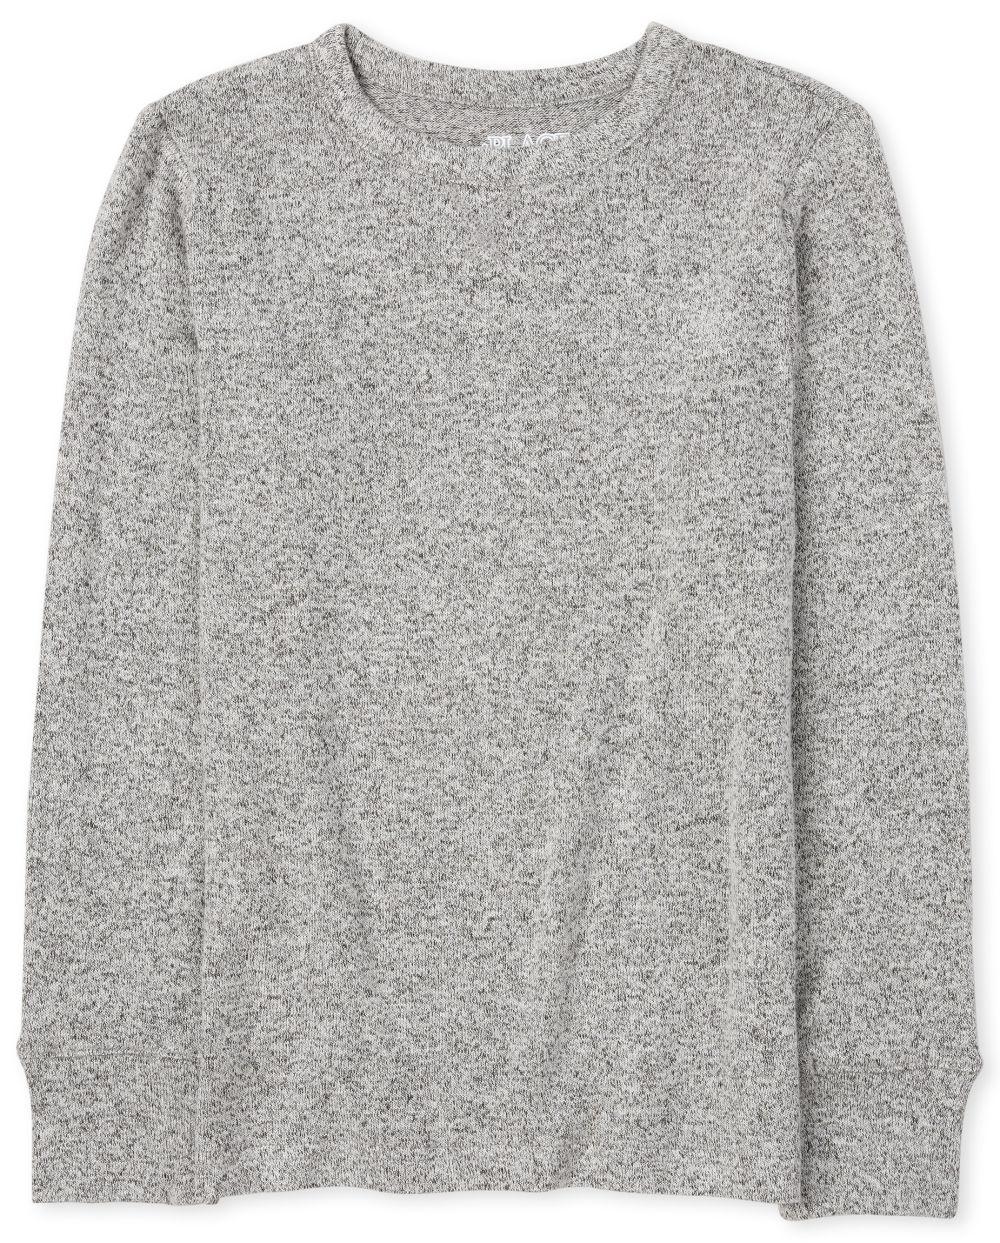 Boys Cozy Lightweight Sweater - Gray